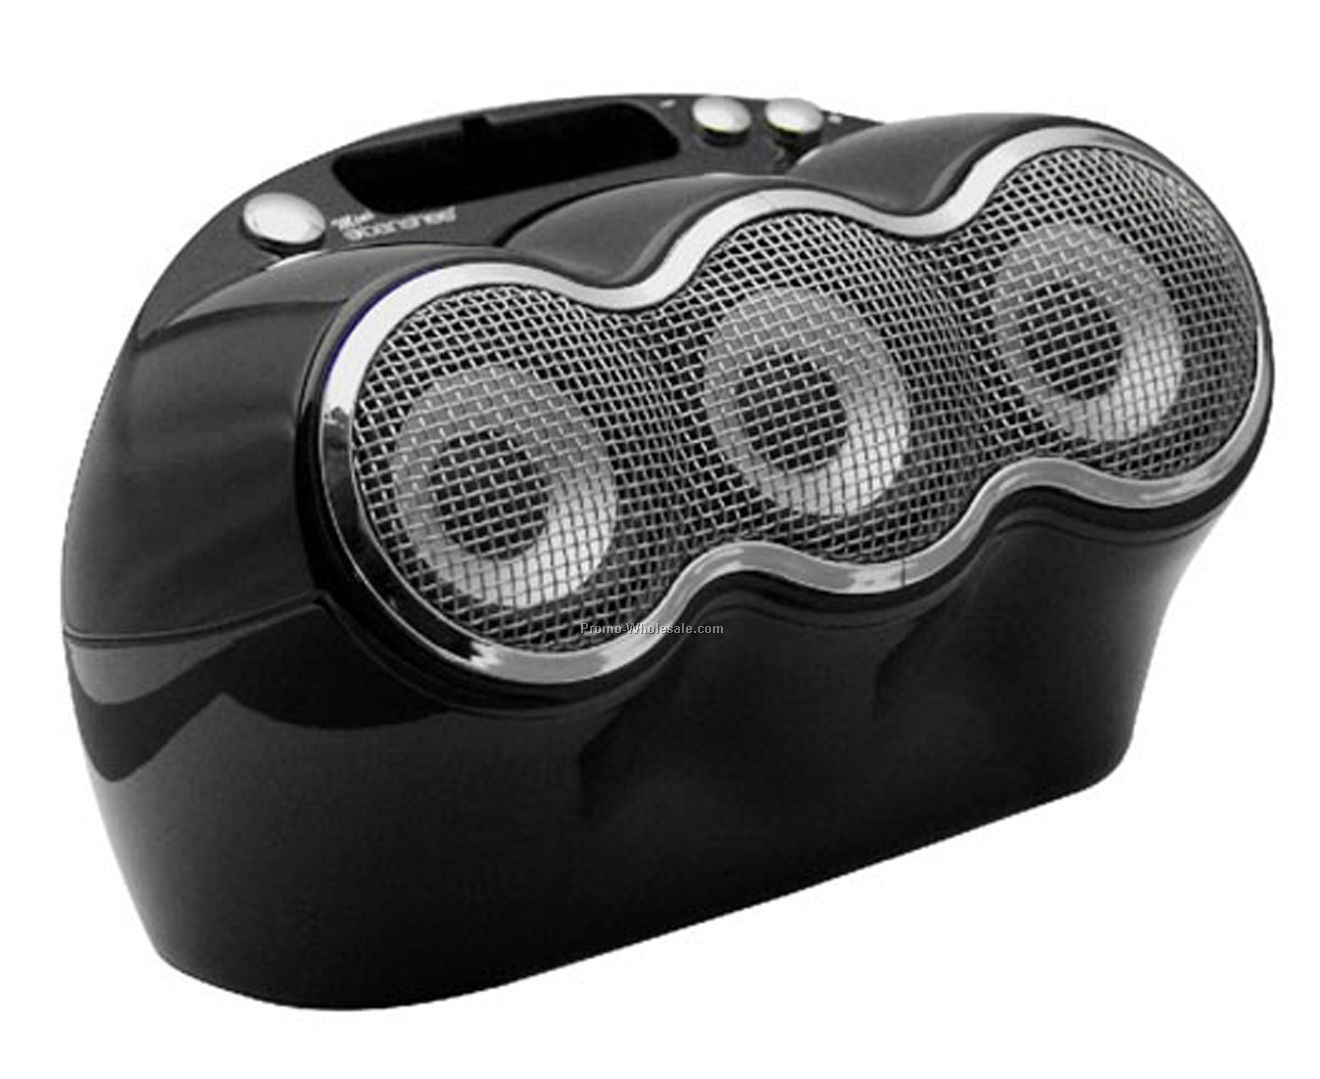 Jensen audio products